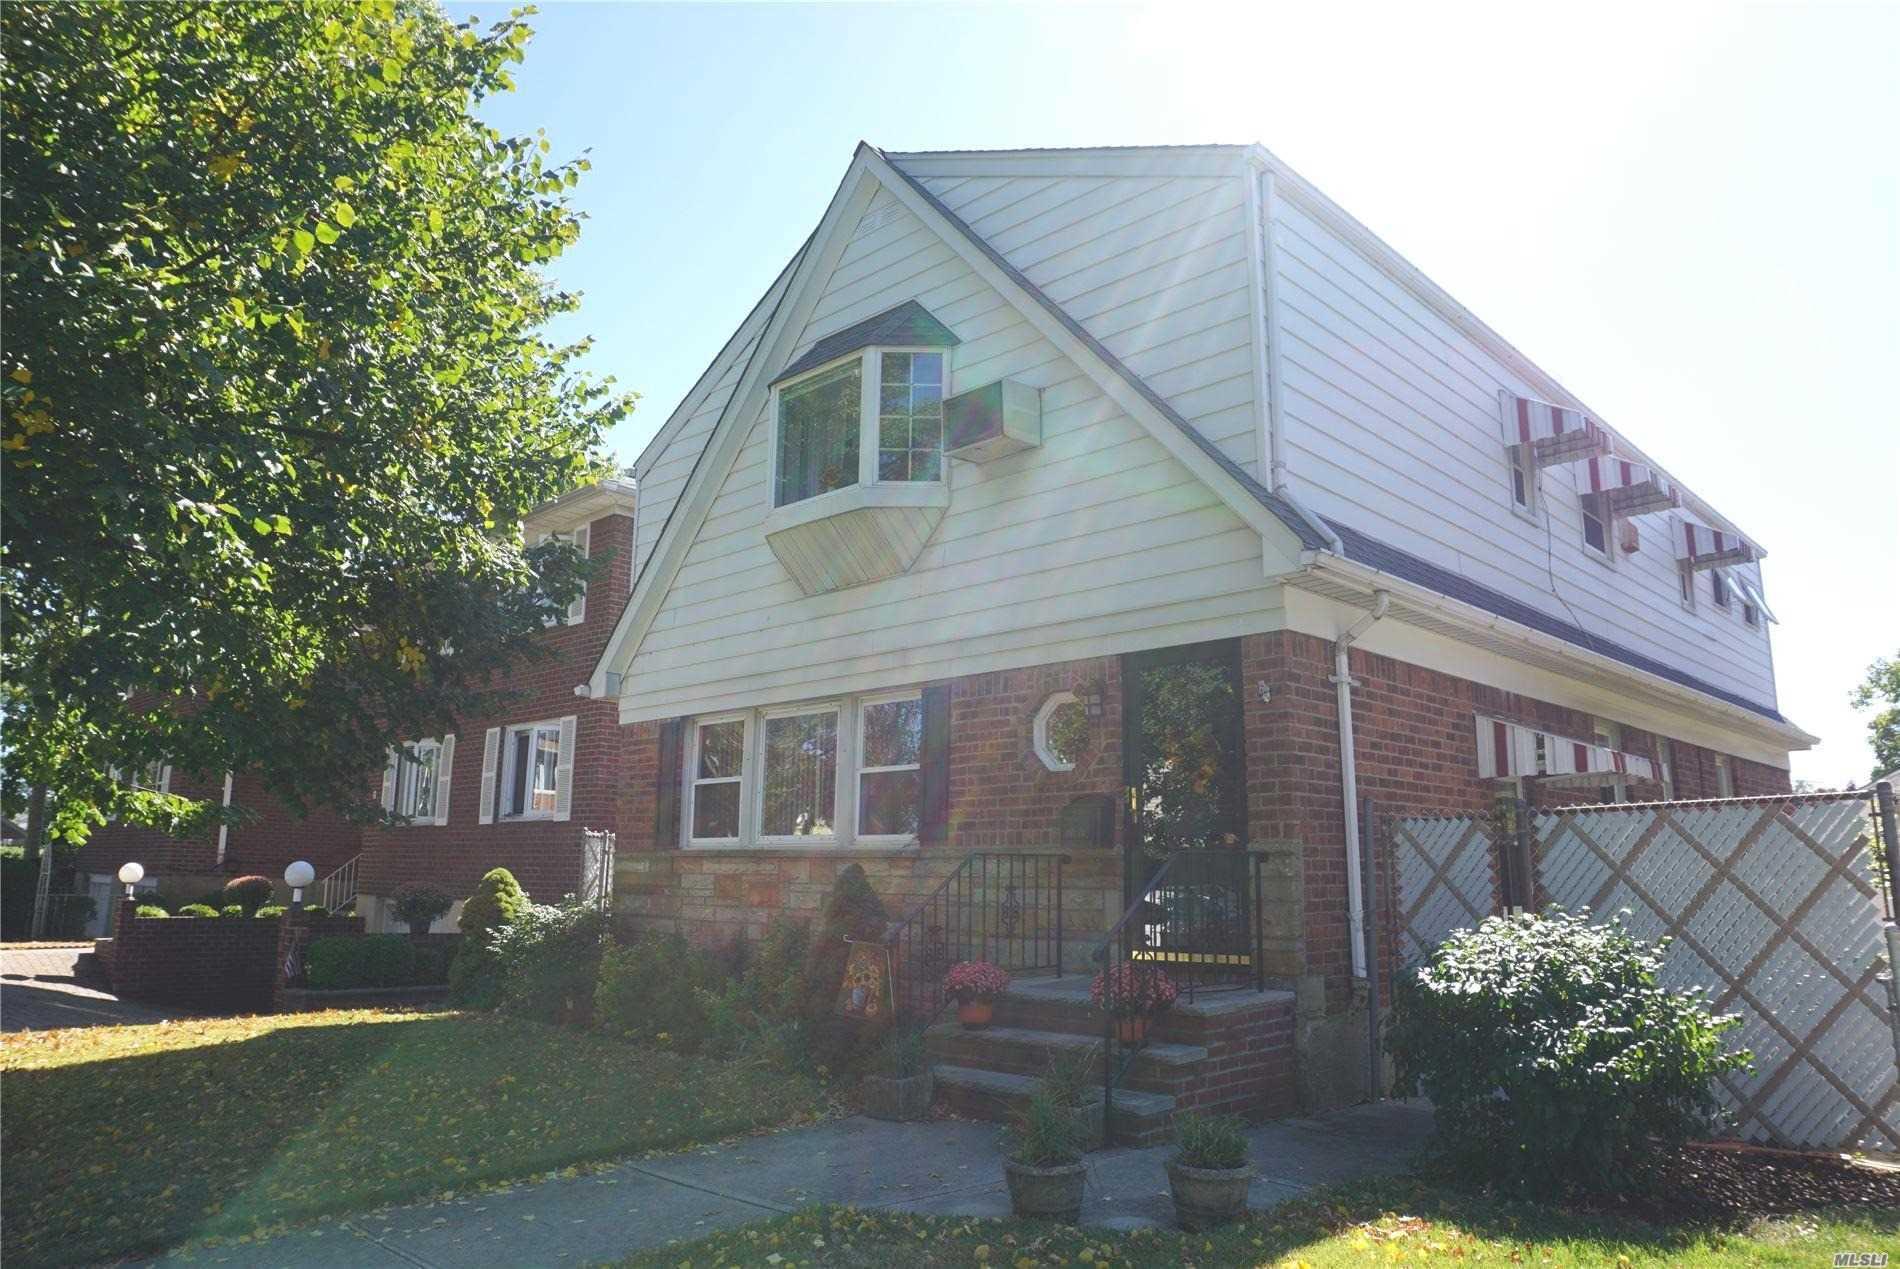 Property for sale at 151-74 22 Ave, Whitestone NY 11357, Whitestone,  New York 11357